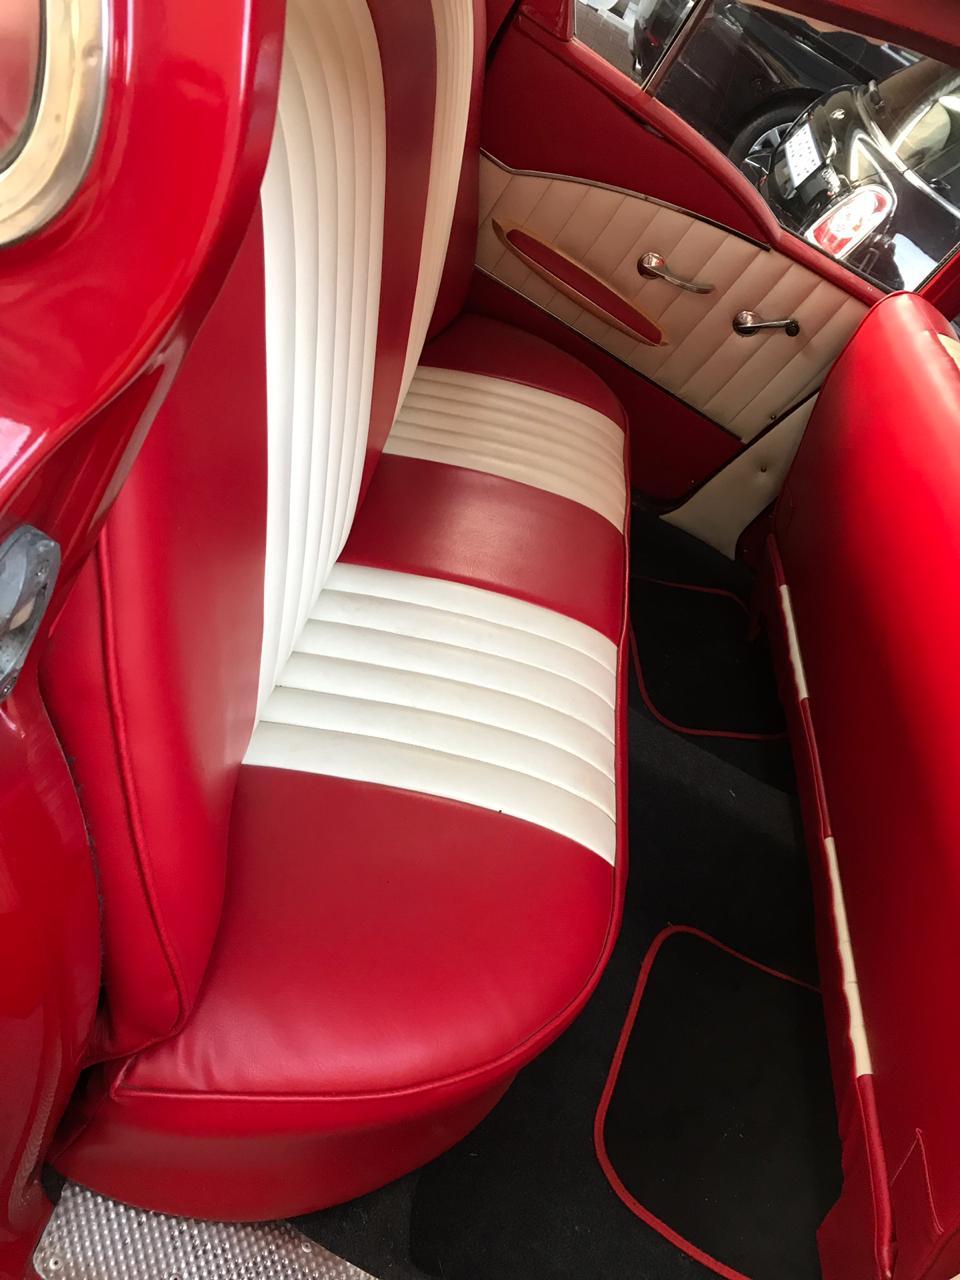 1958 Chevy Biscayne V8